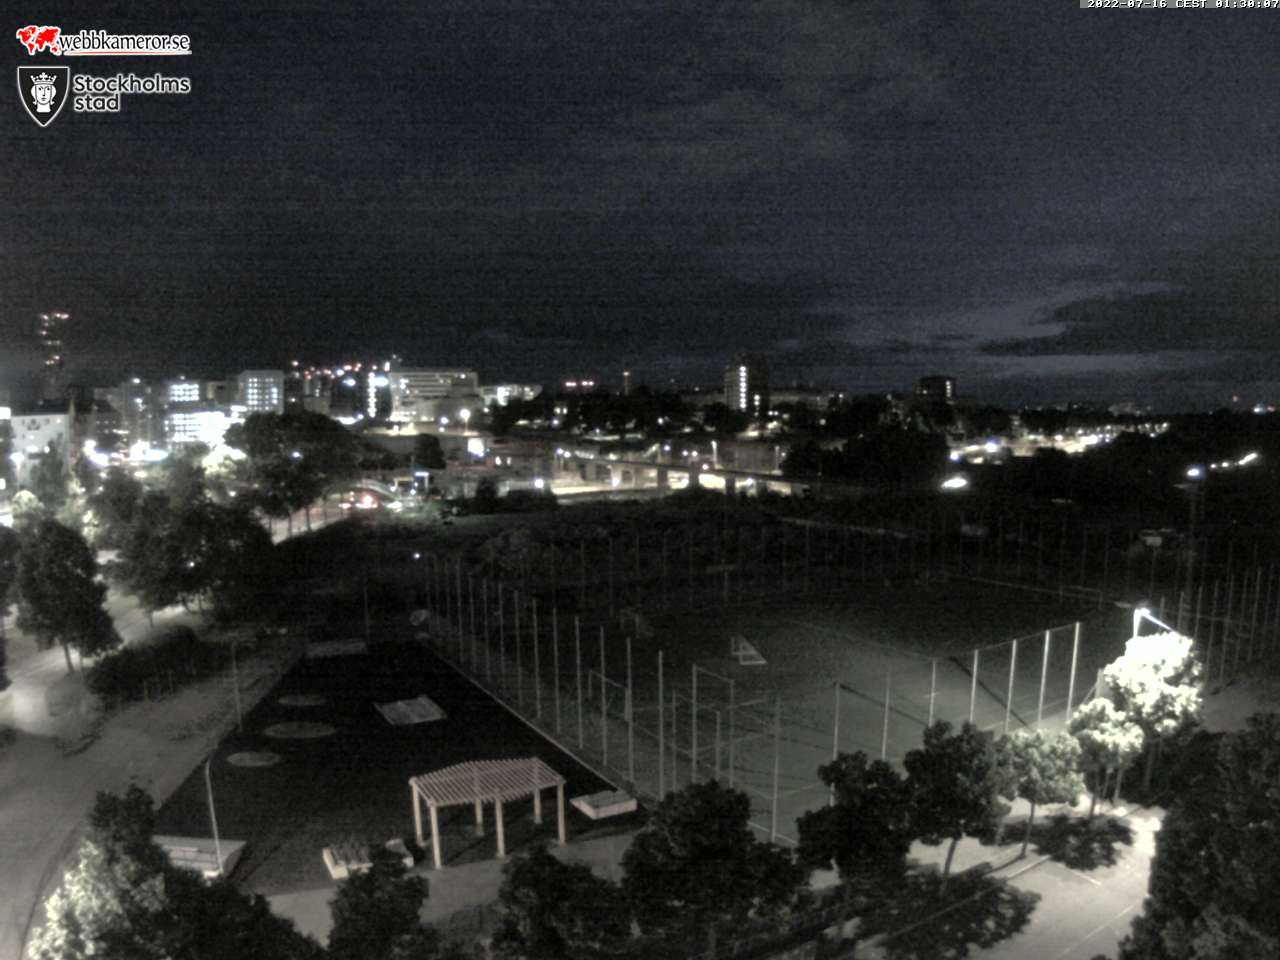 Webbkamera - Norrtull, Stockholm.